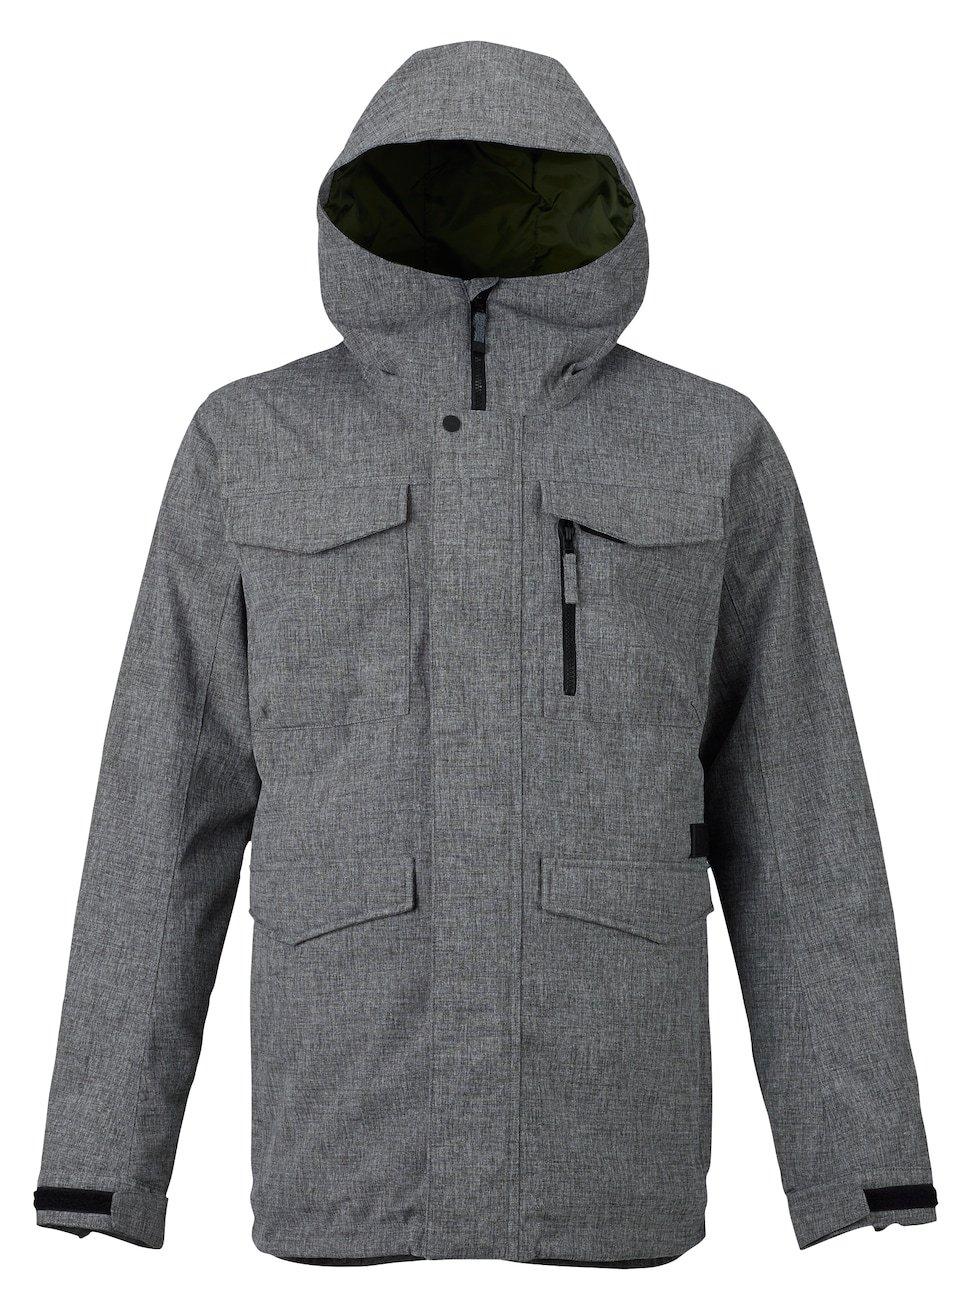 Burton Men's Covert Jacket, Bog Heather, X-Large 130651